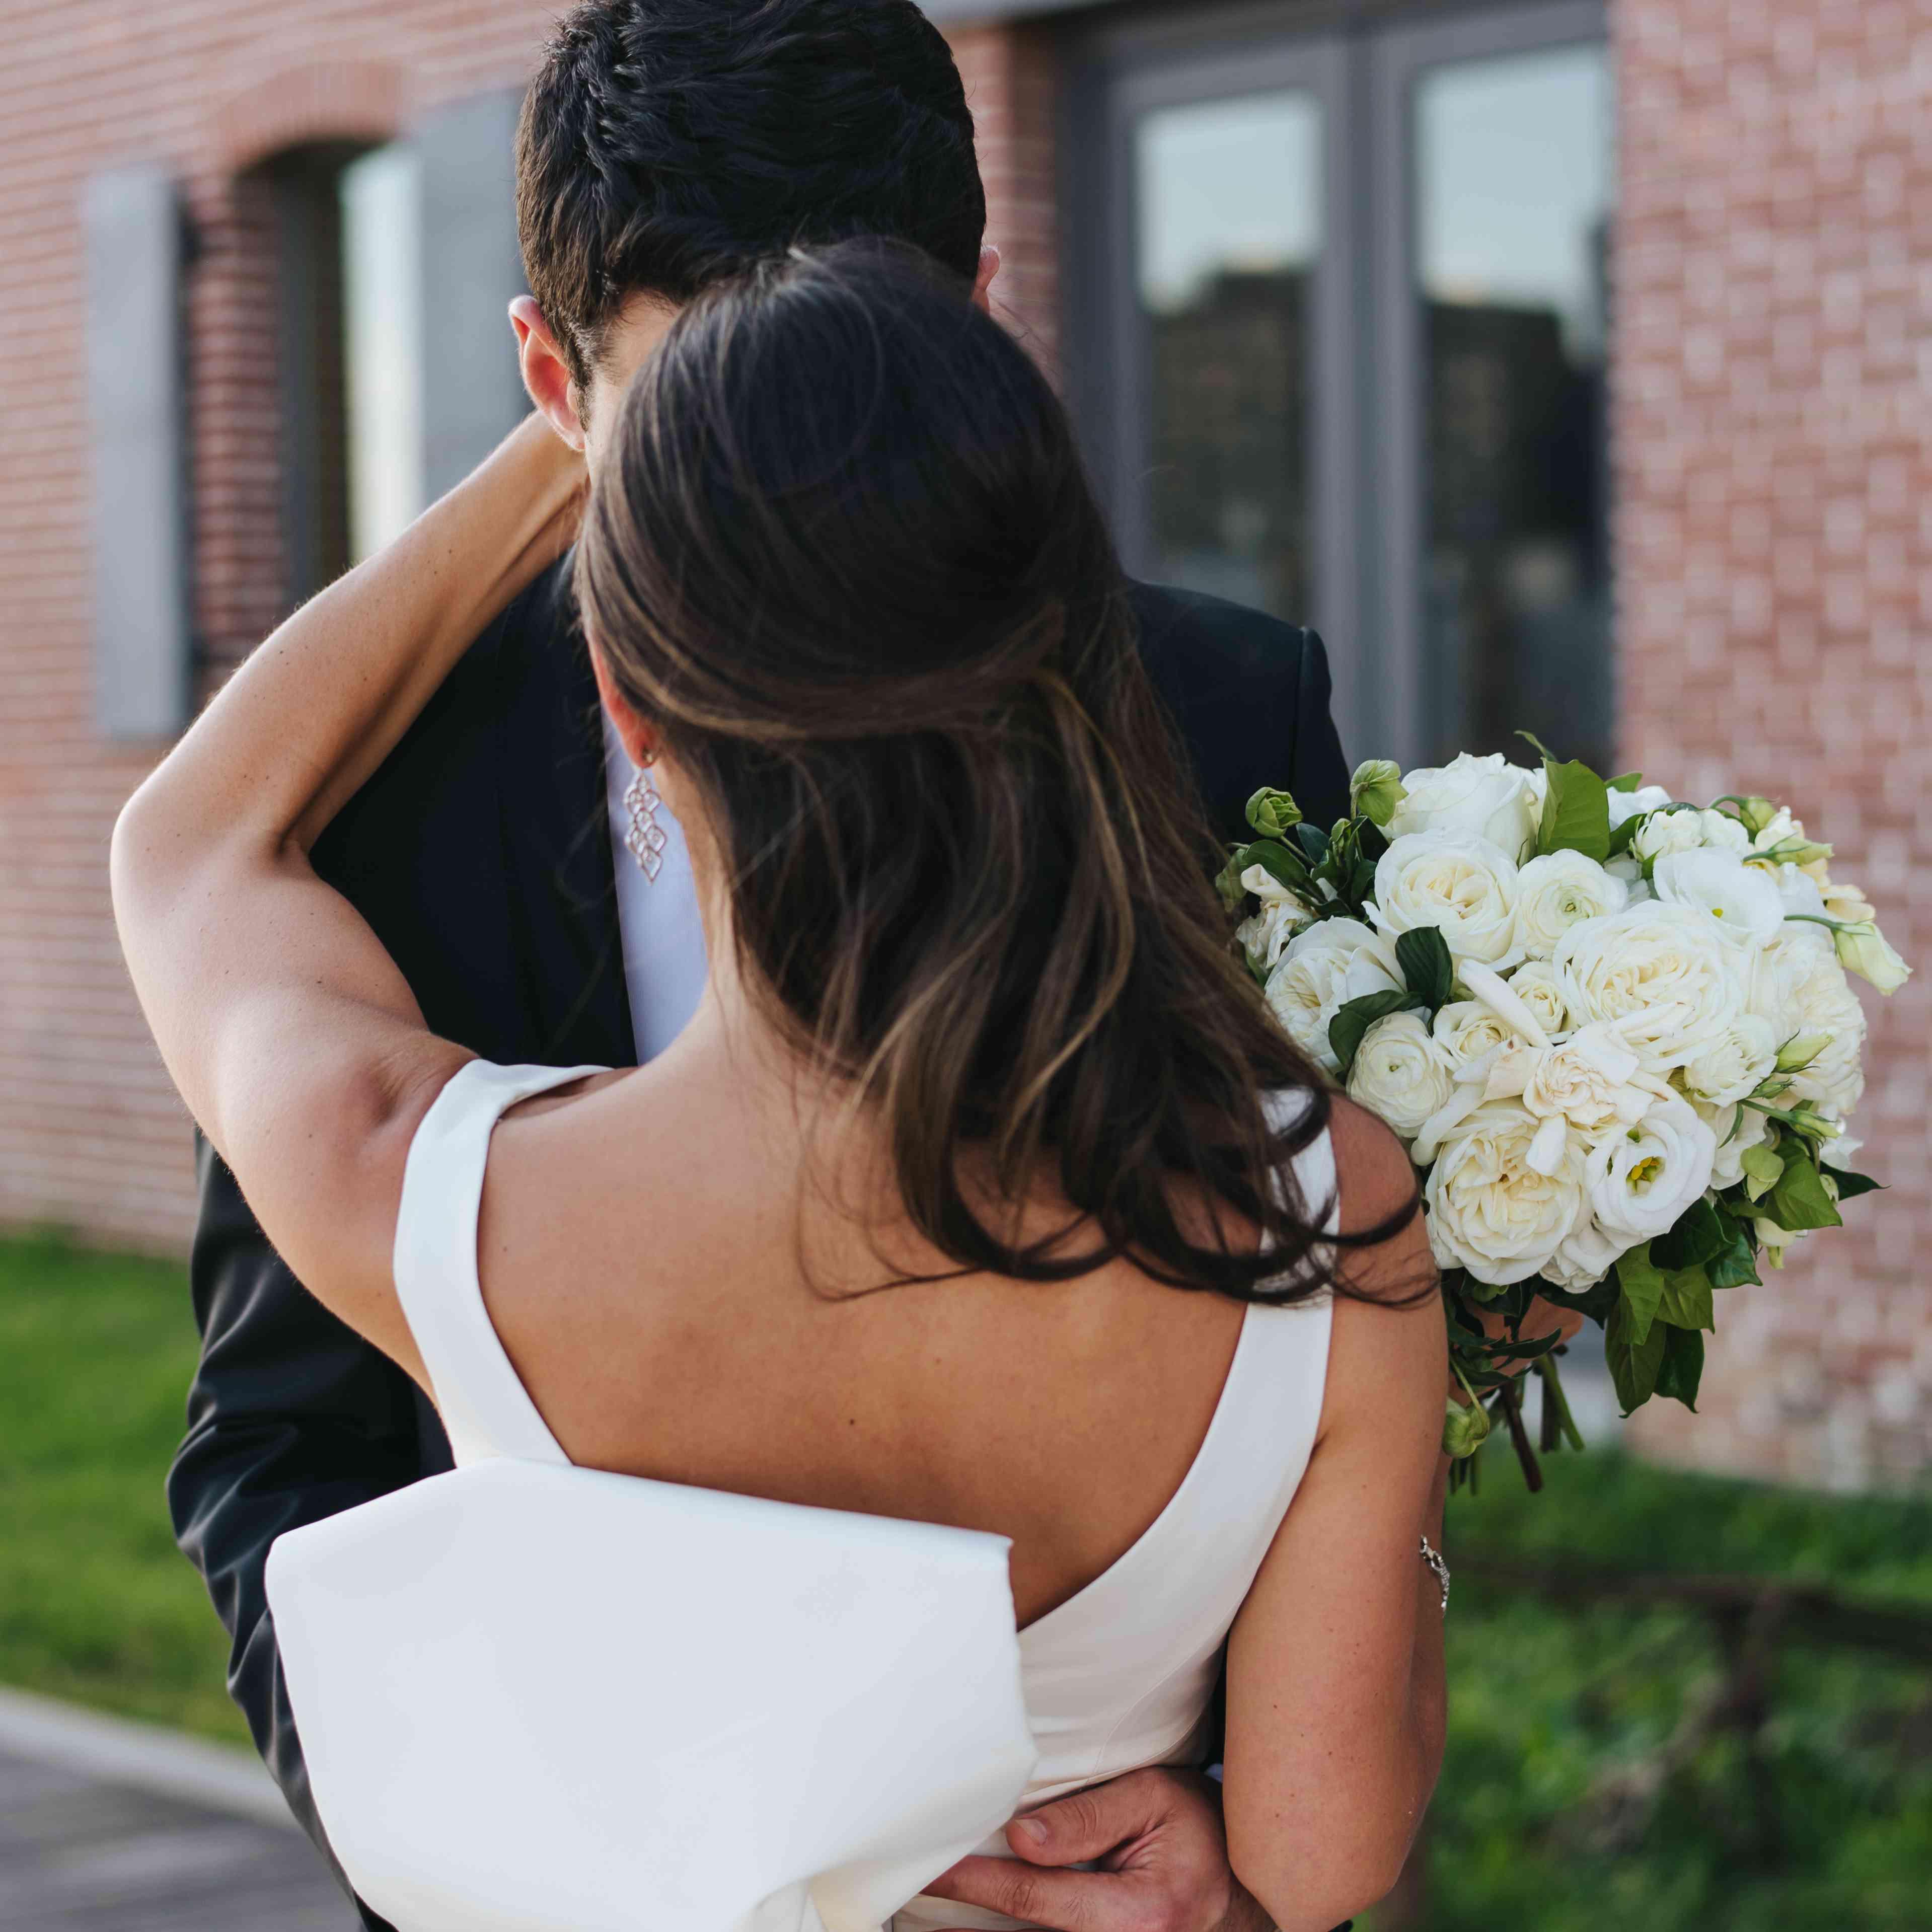 bride ad groom kissing